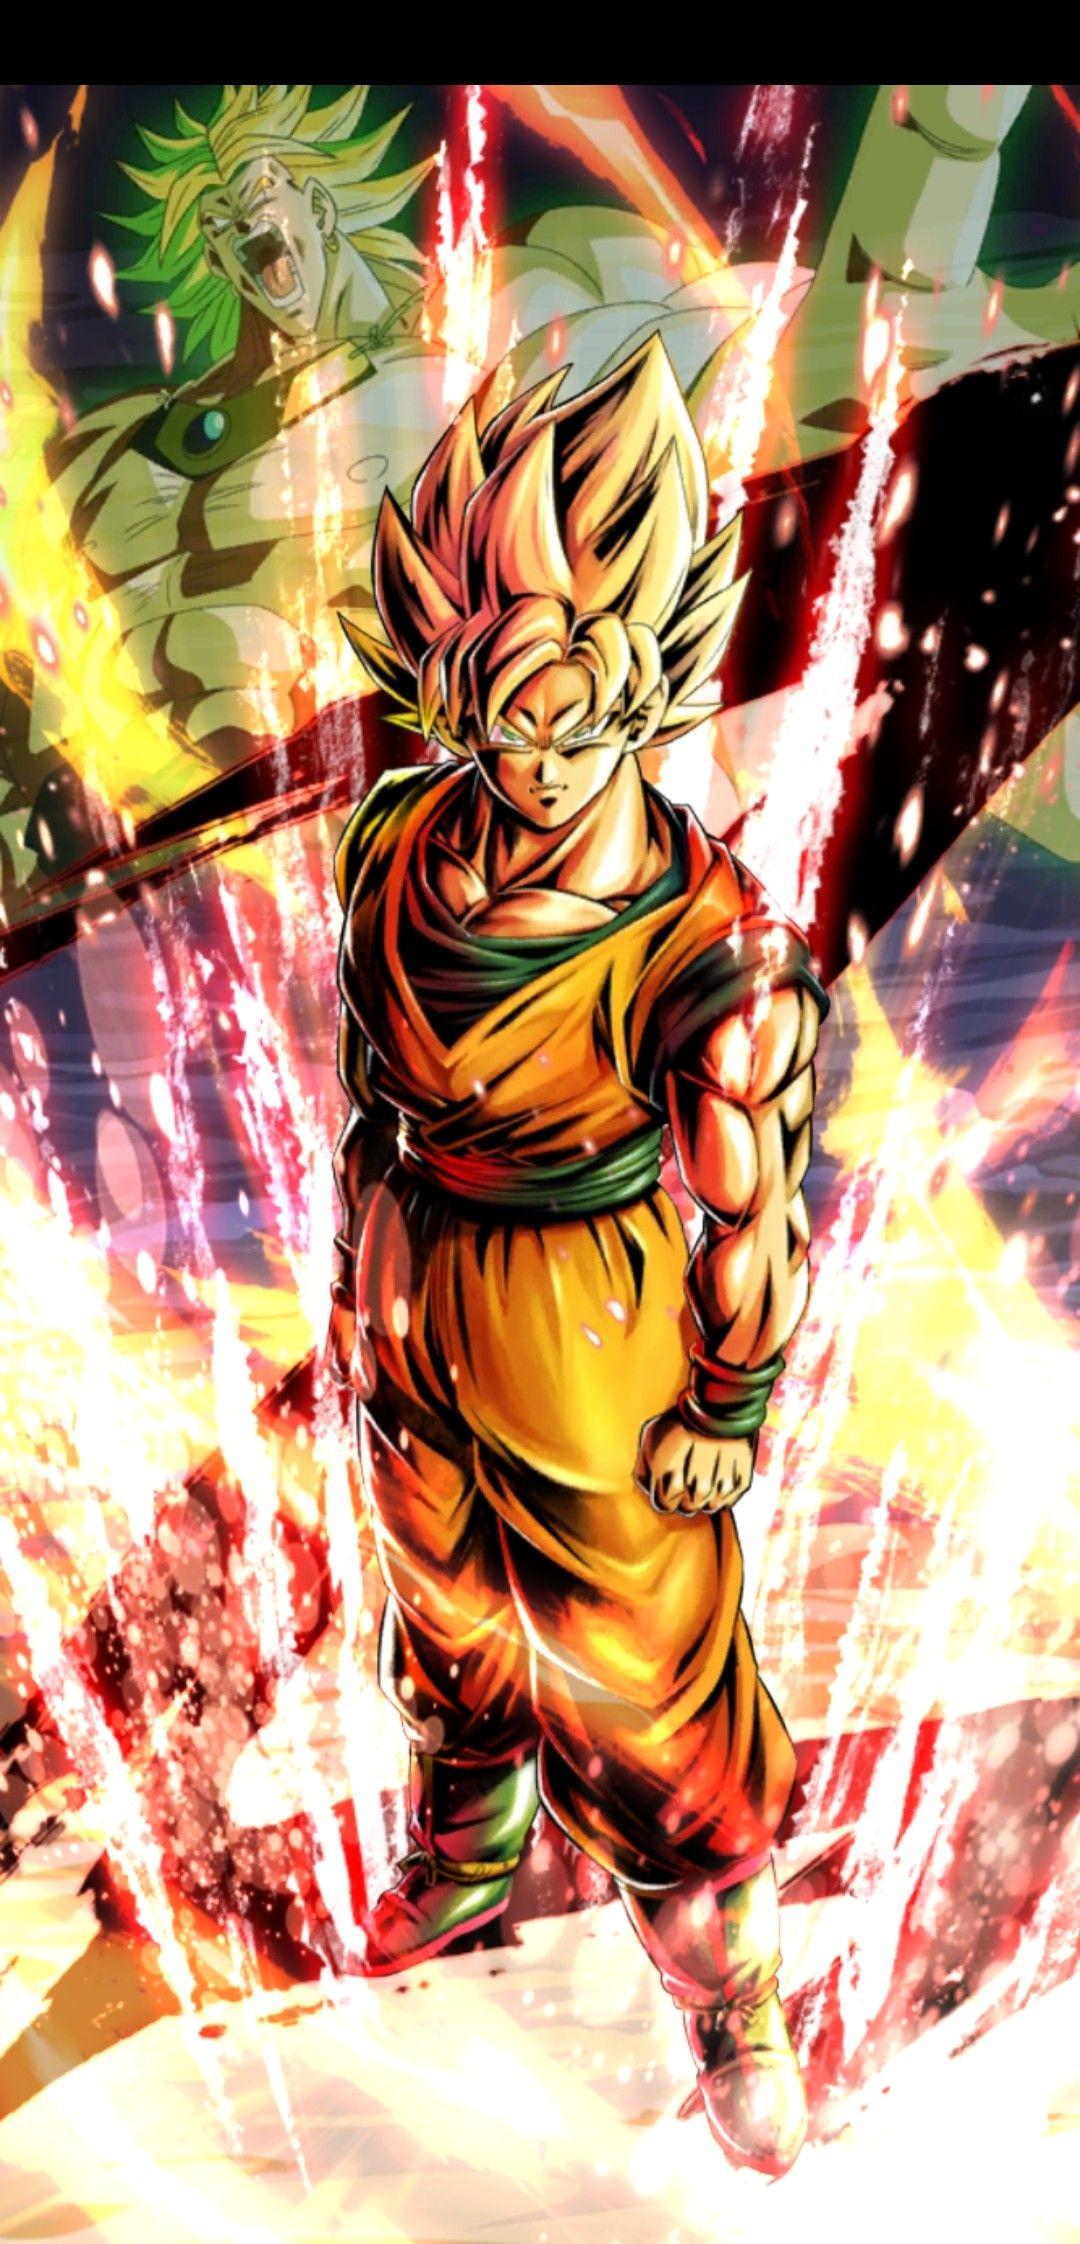 Goku Ssj in 2020 Anime dragon ball super, Dragon ball